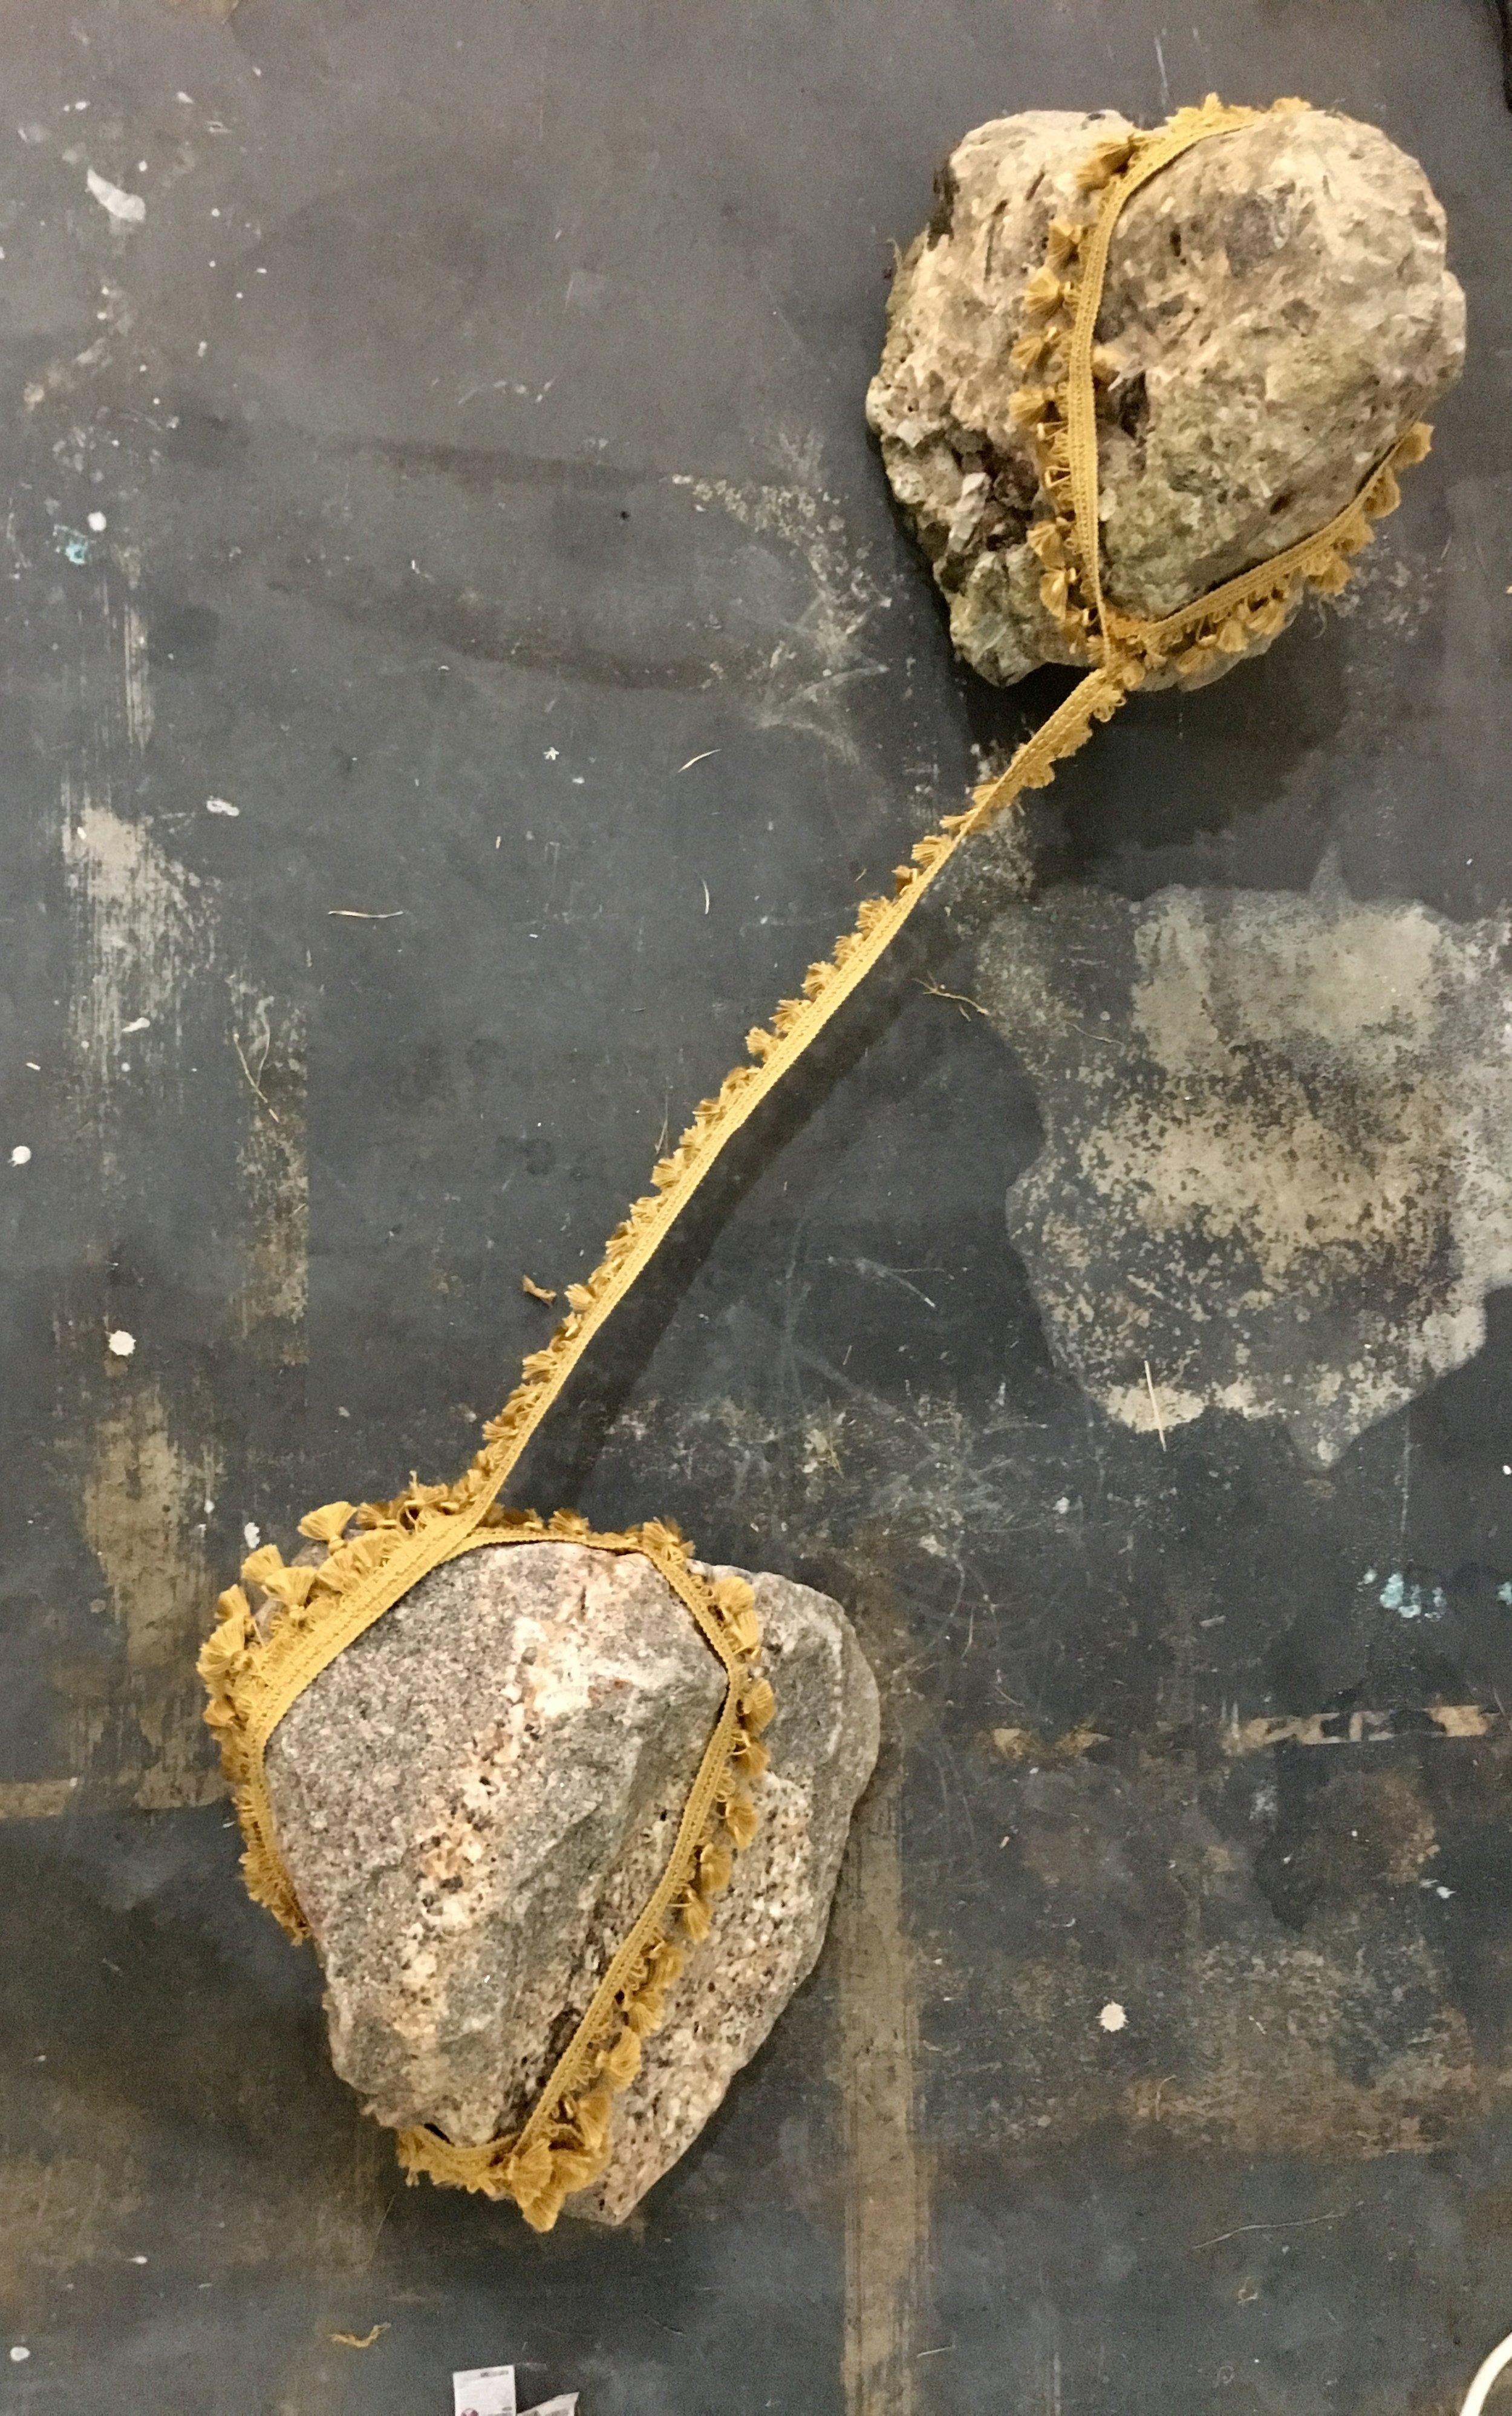 Wedded rocks